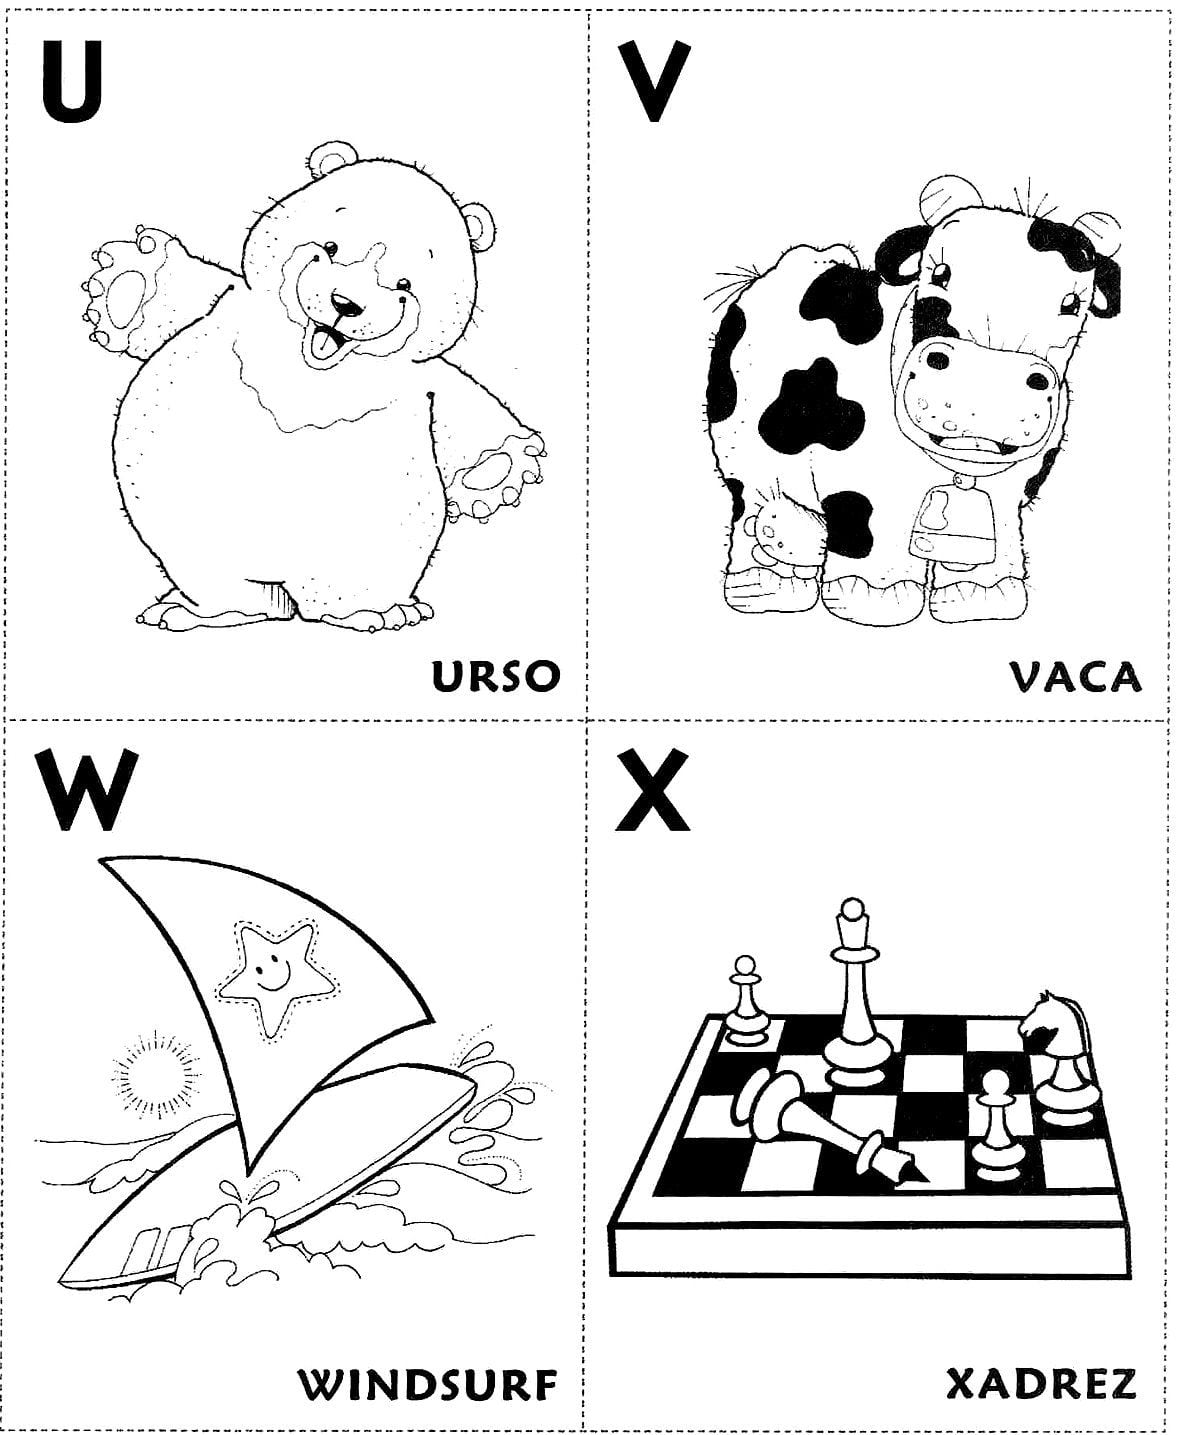 Alfabeto Ilustrado (abecedário)